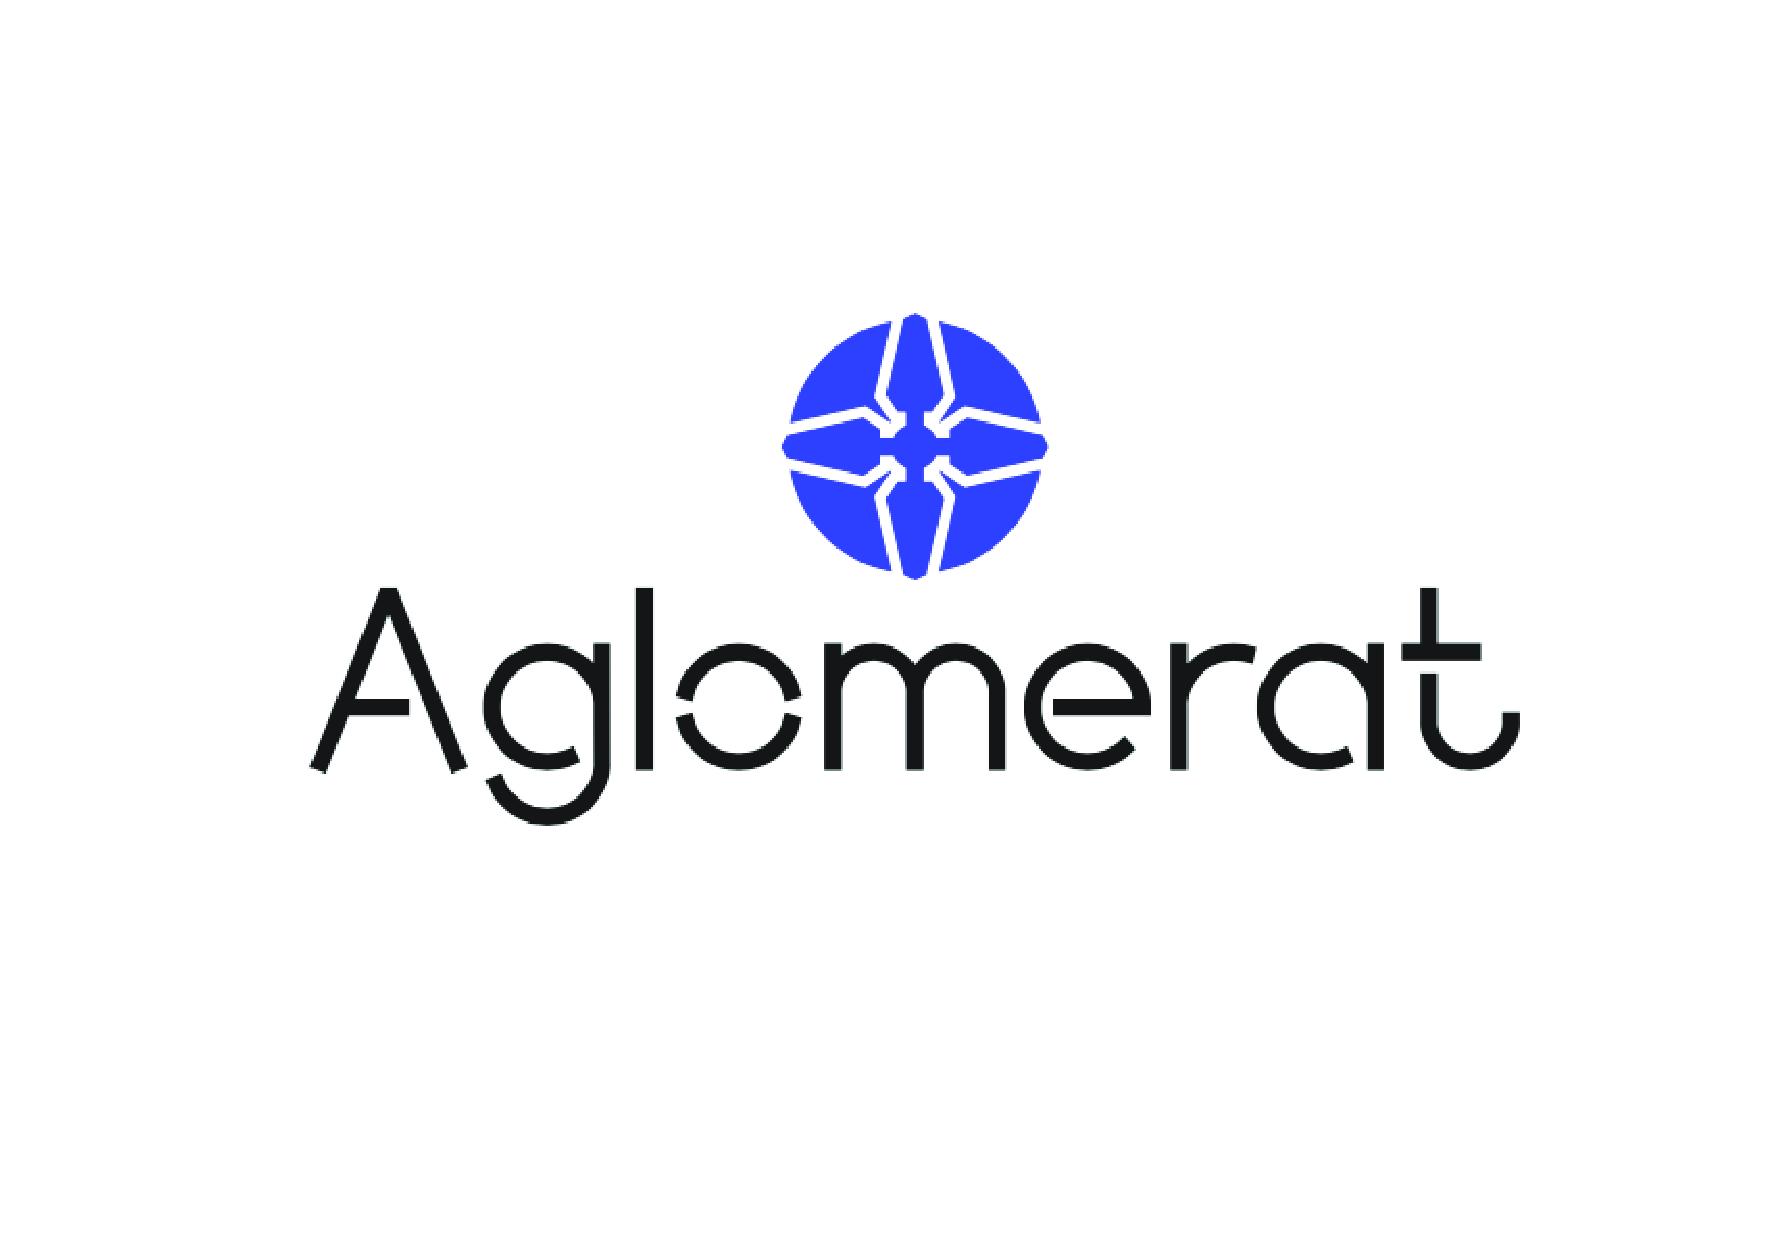 Aglomerat